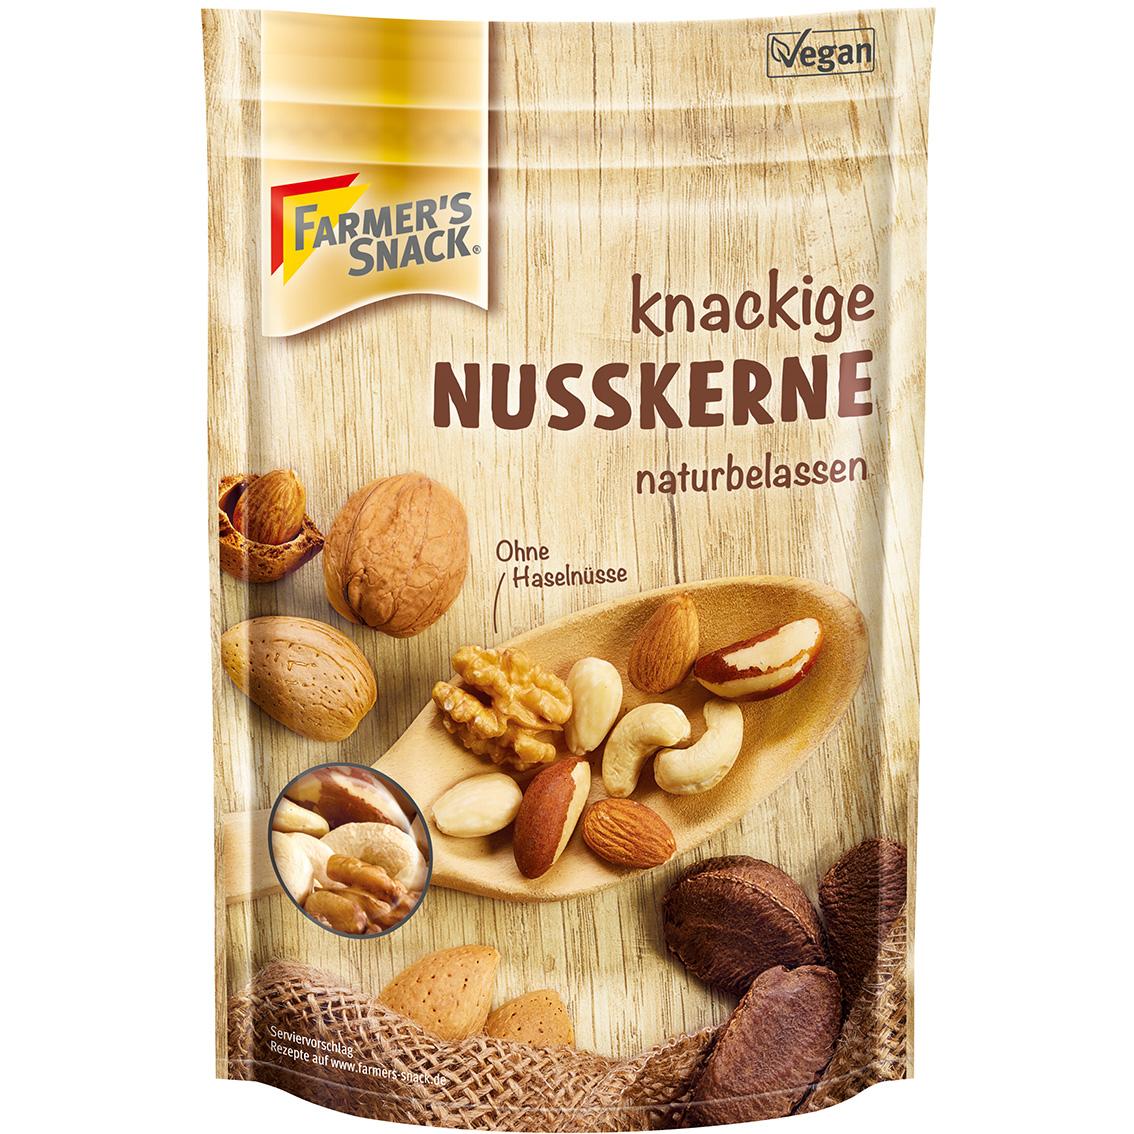 Farmer\'s Snack Knackige Nusskerne naturbelassen | Online kaufen im ...